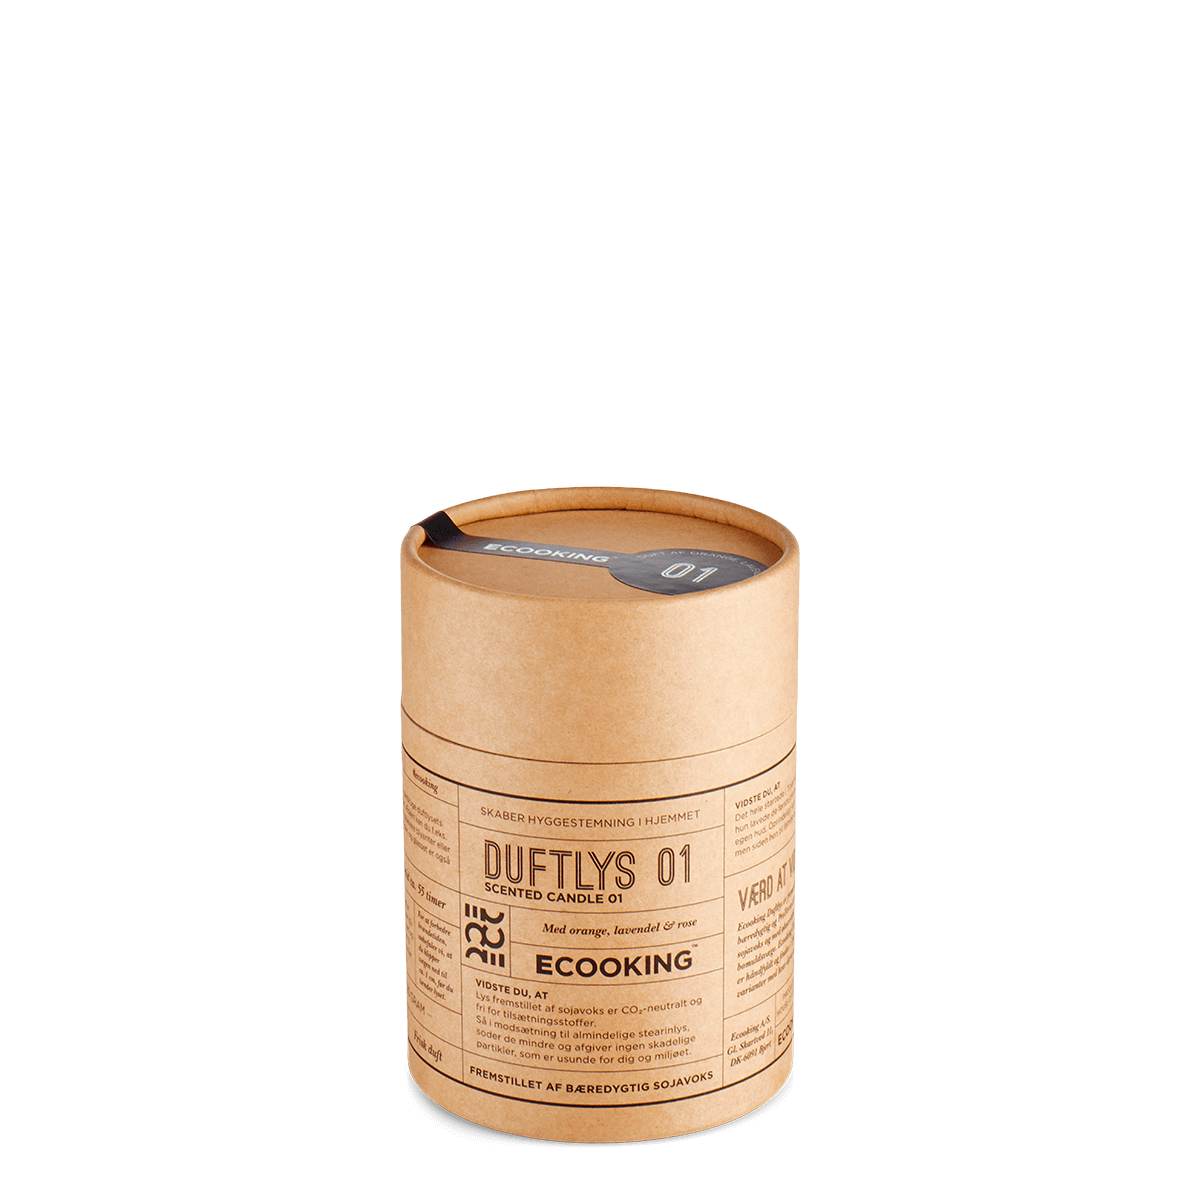 Duftlys 01 220 gram